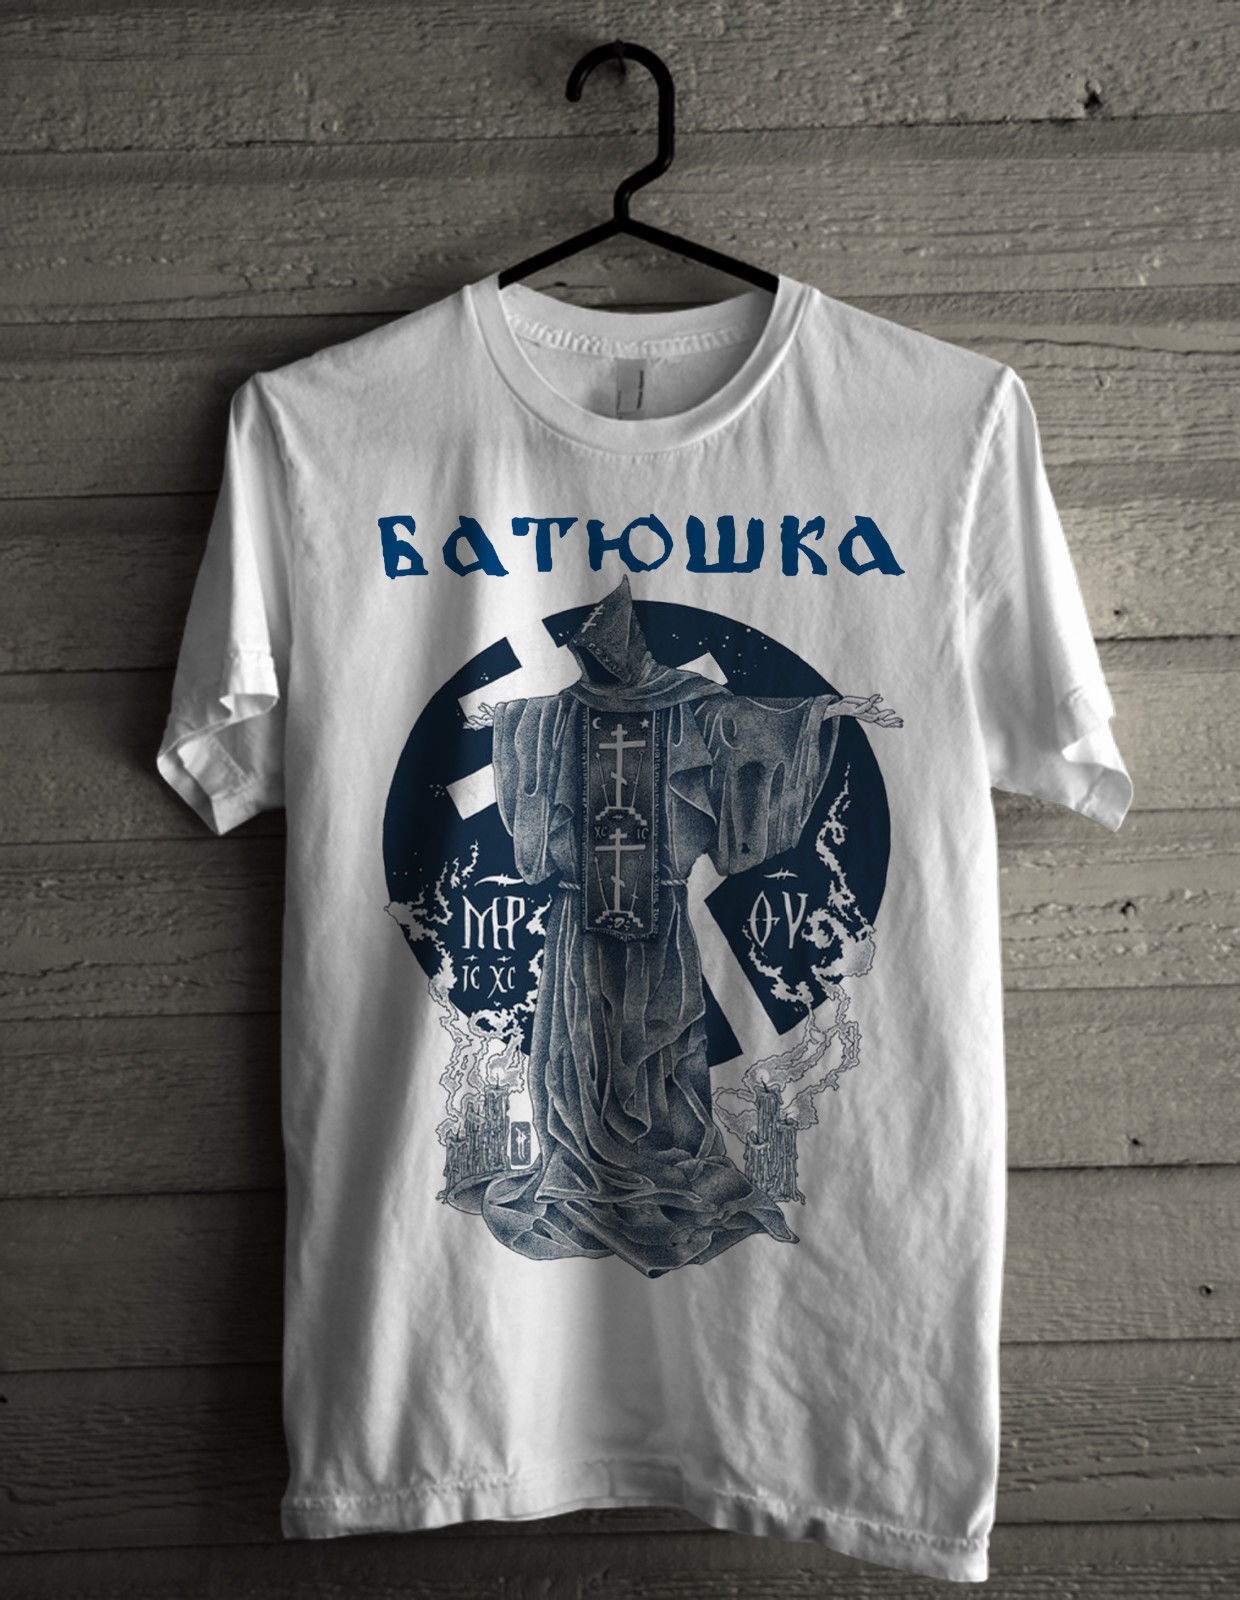 Mgla Batushka Ava Size Bolzer Marduk Behemoth Asphyx T S Shirt 3xl qFUpxBw1q